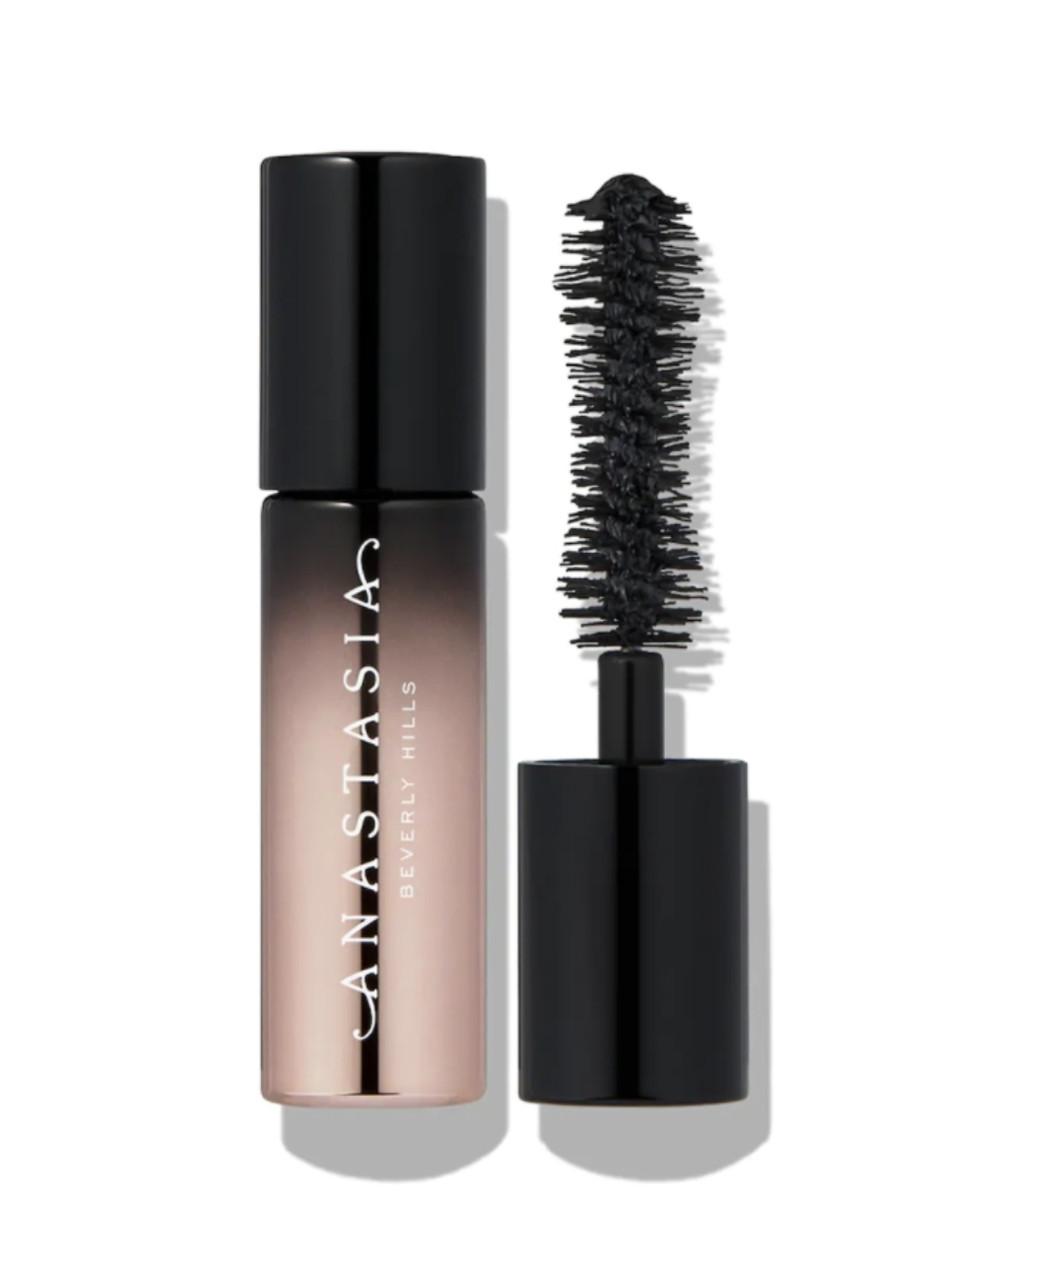 Тушь для ресниц Anastasia Beverly Hills Lash Brag Volumizing Mascara 2.5g